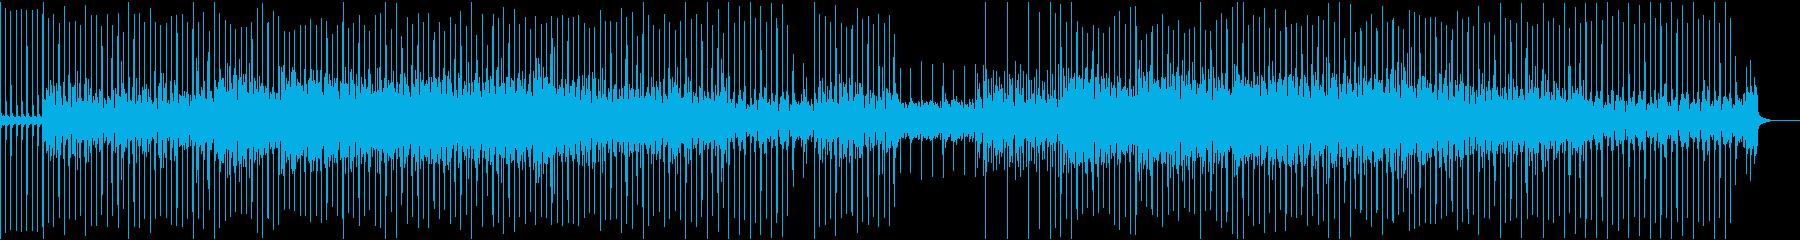 RPGのエンディング風なBGMの再生済みの波形